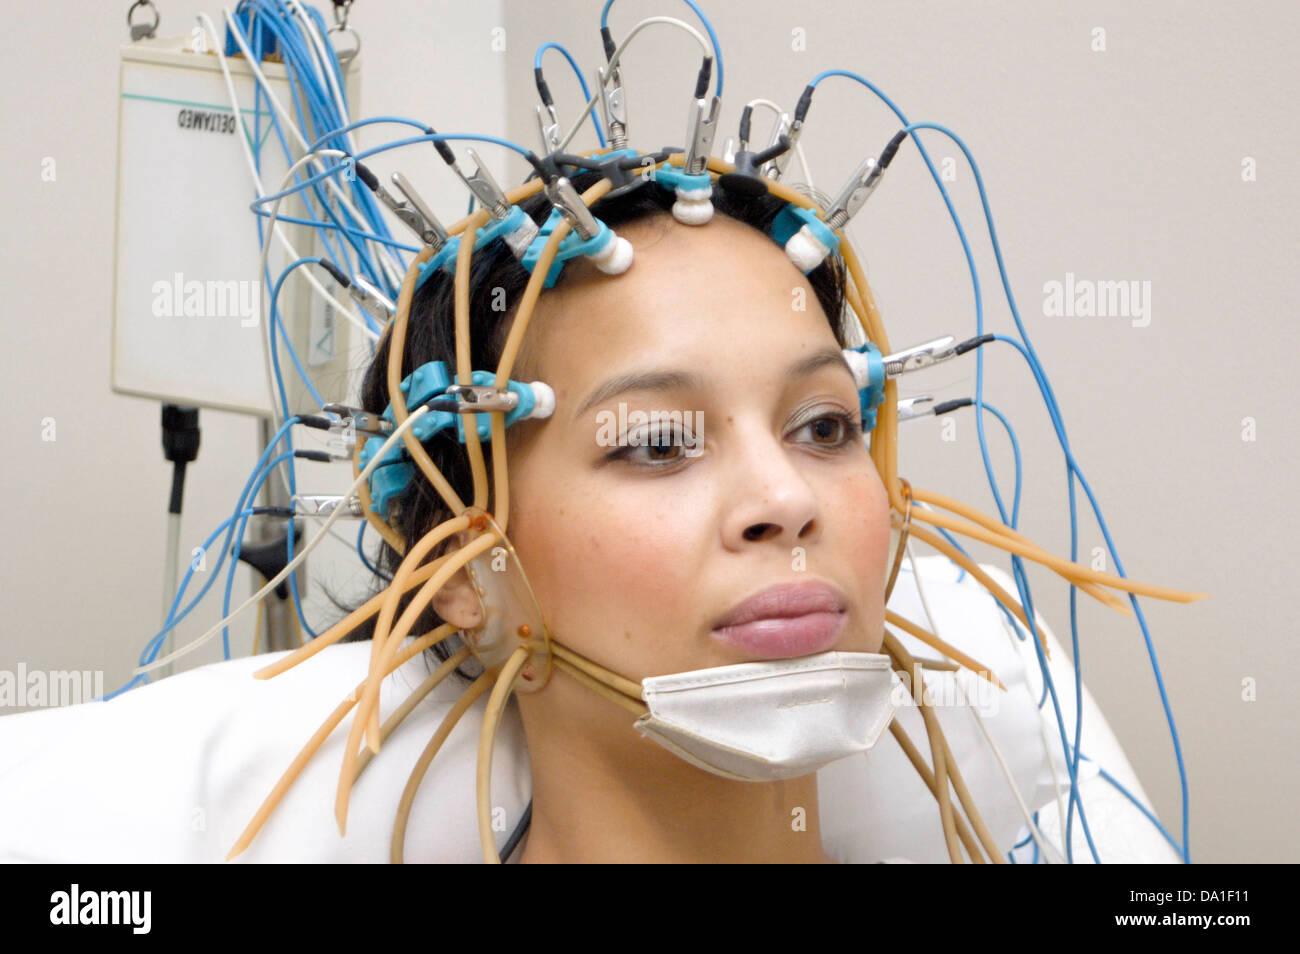 eeg examination of a woman stock photo 57811405 alamy